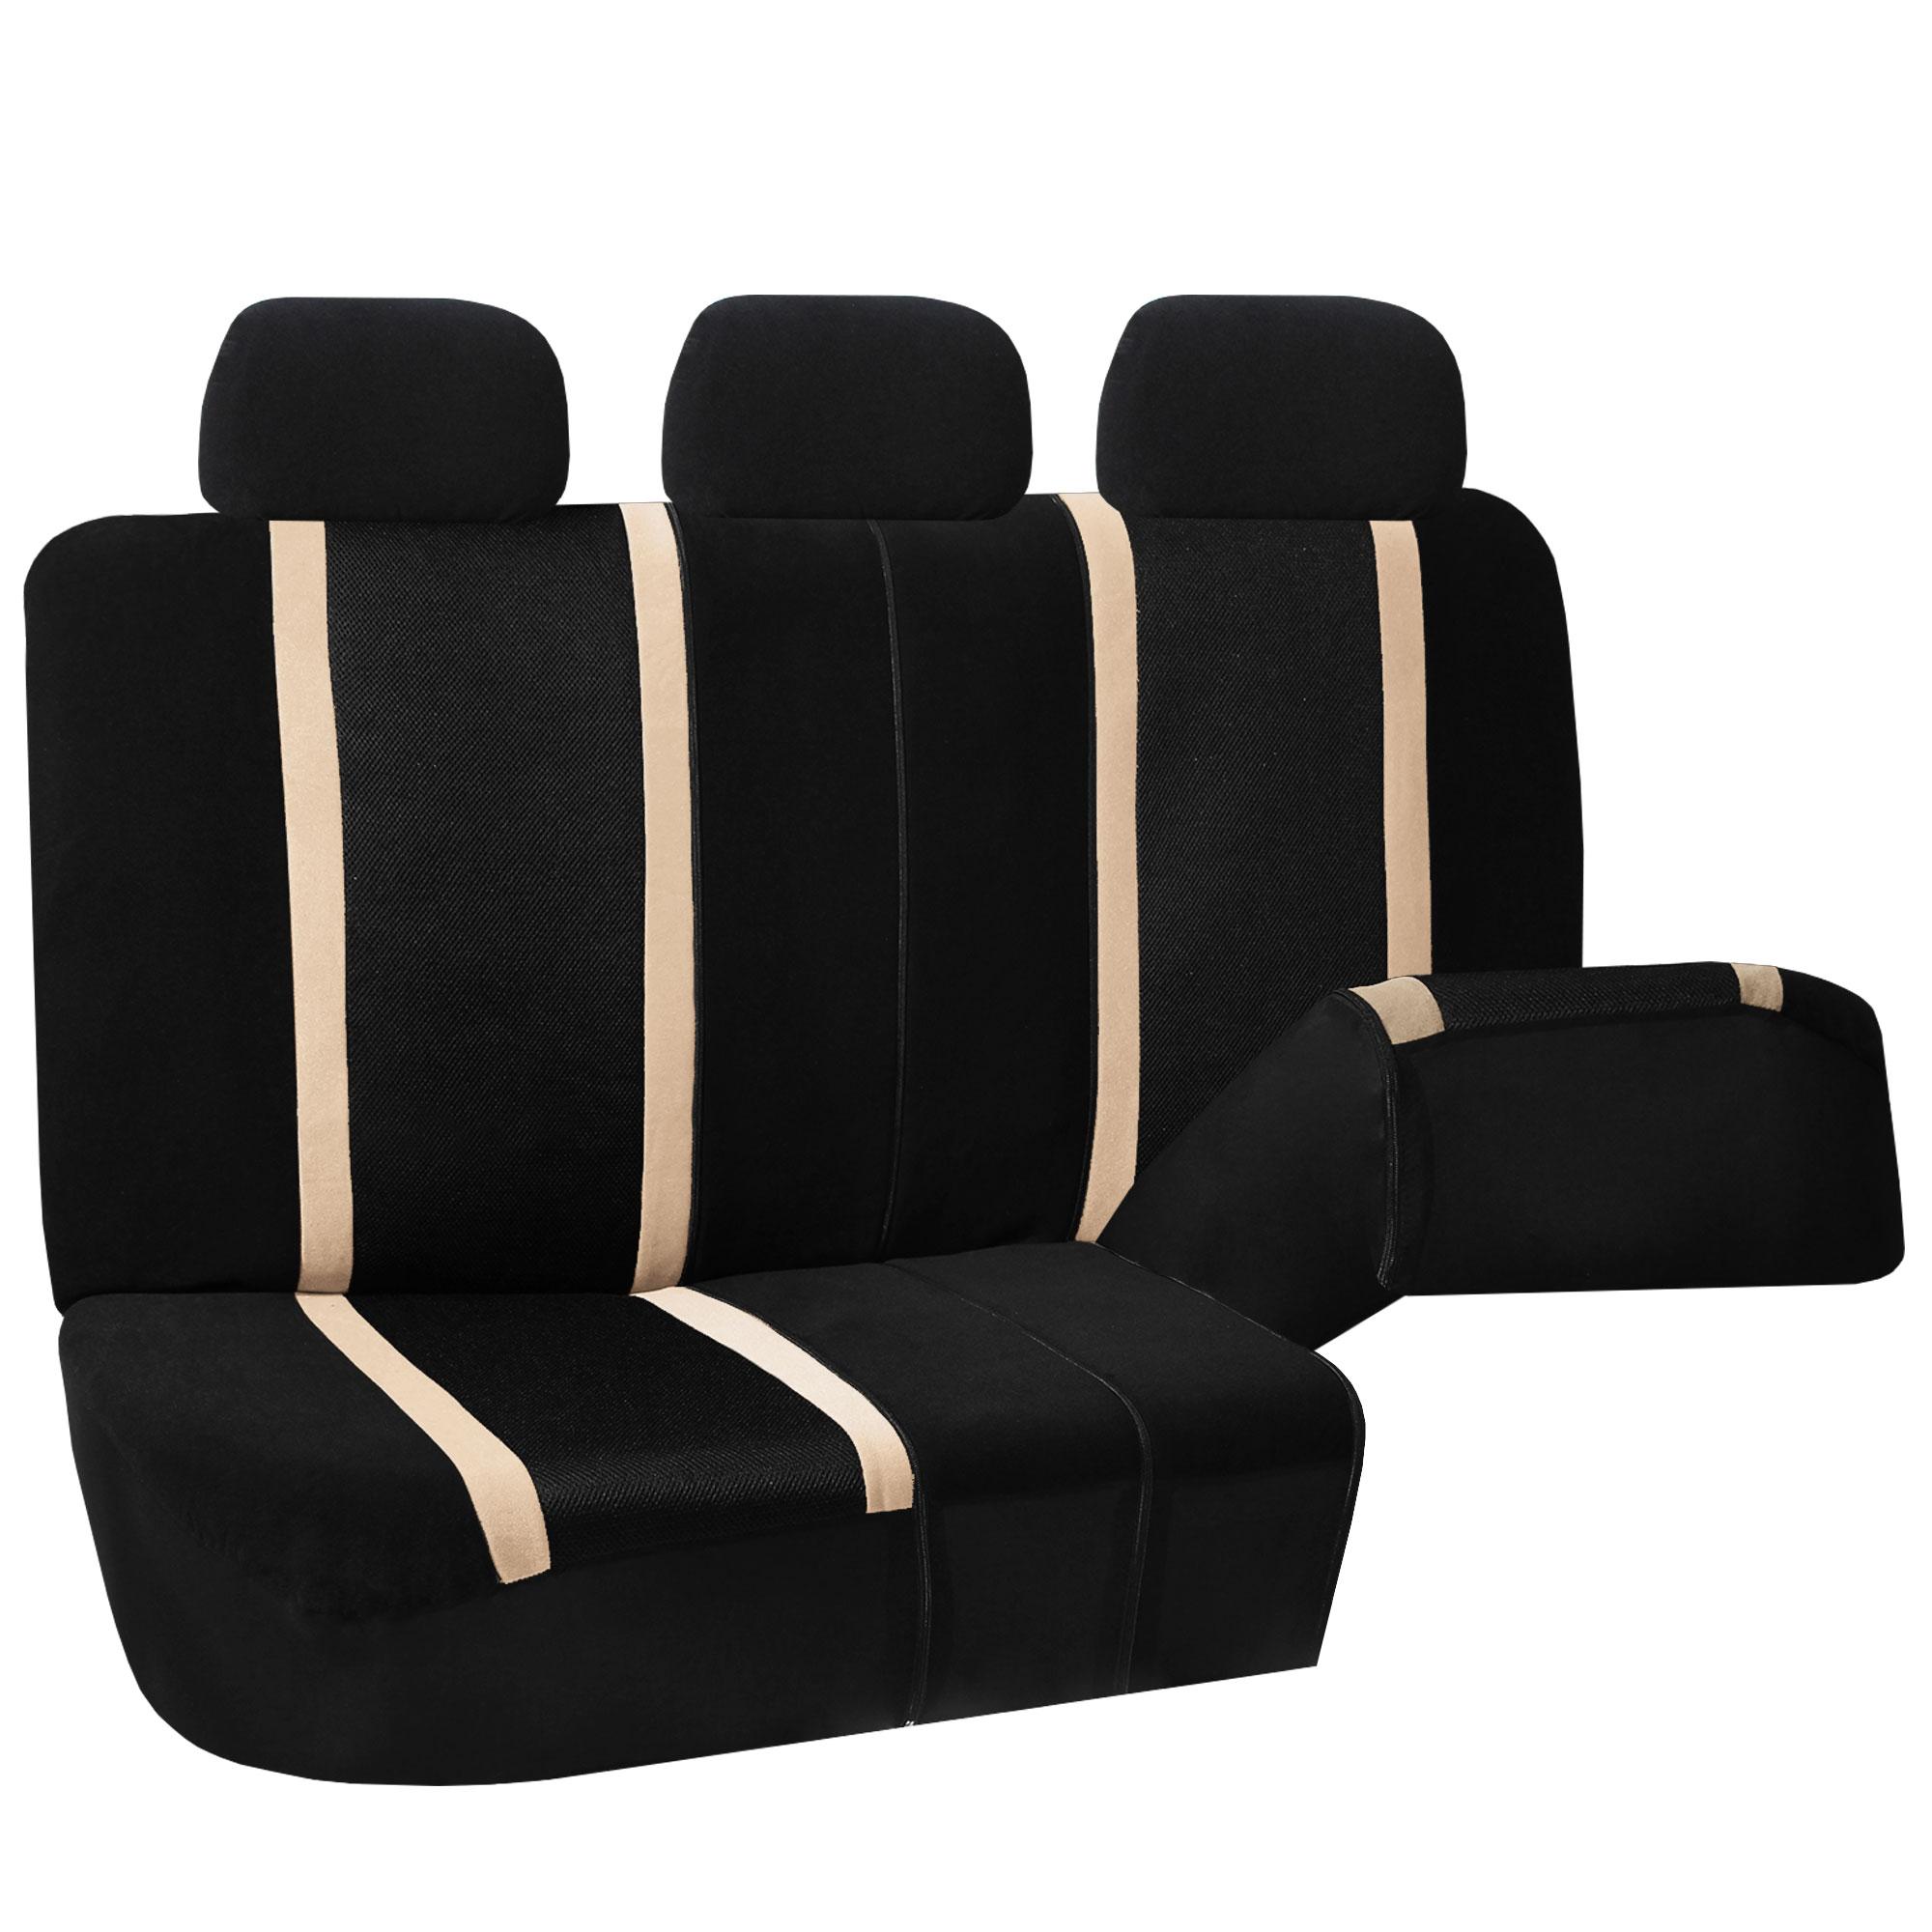 beige black car seat covers set for auto w floor mat ebay. Black Bedroom Furniture Sets. Home Design Ideas